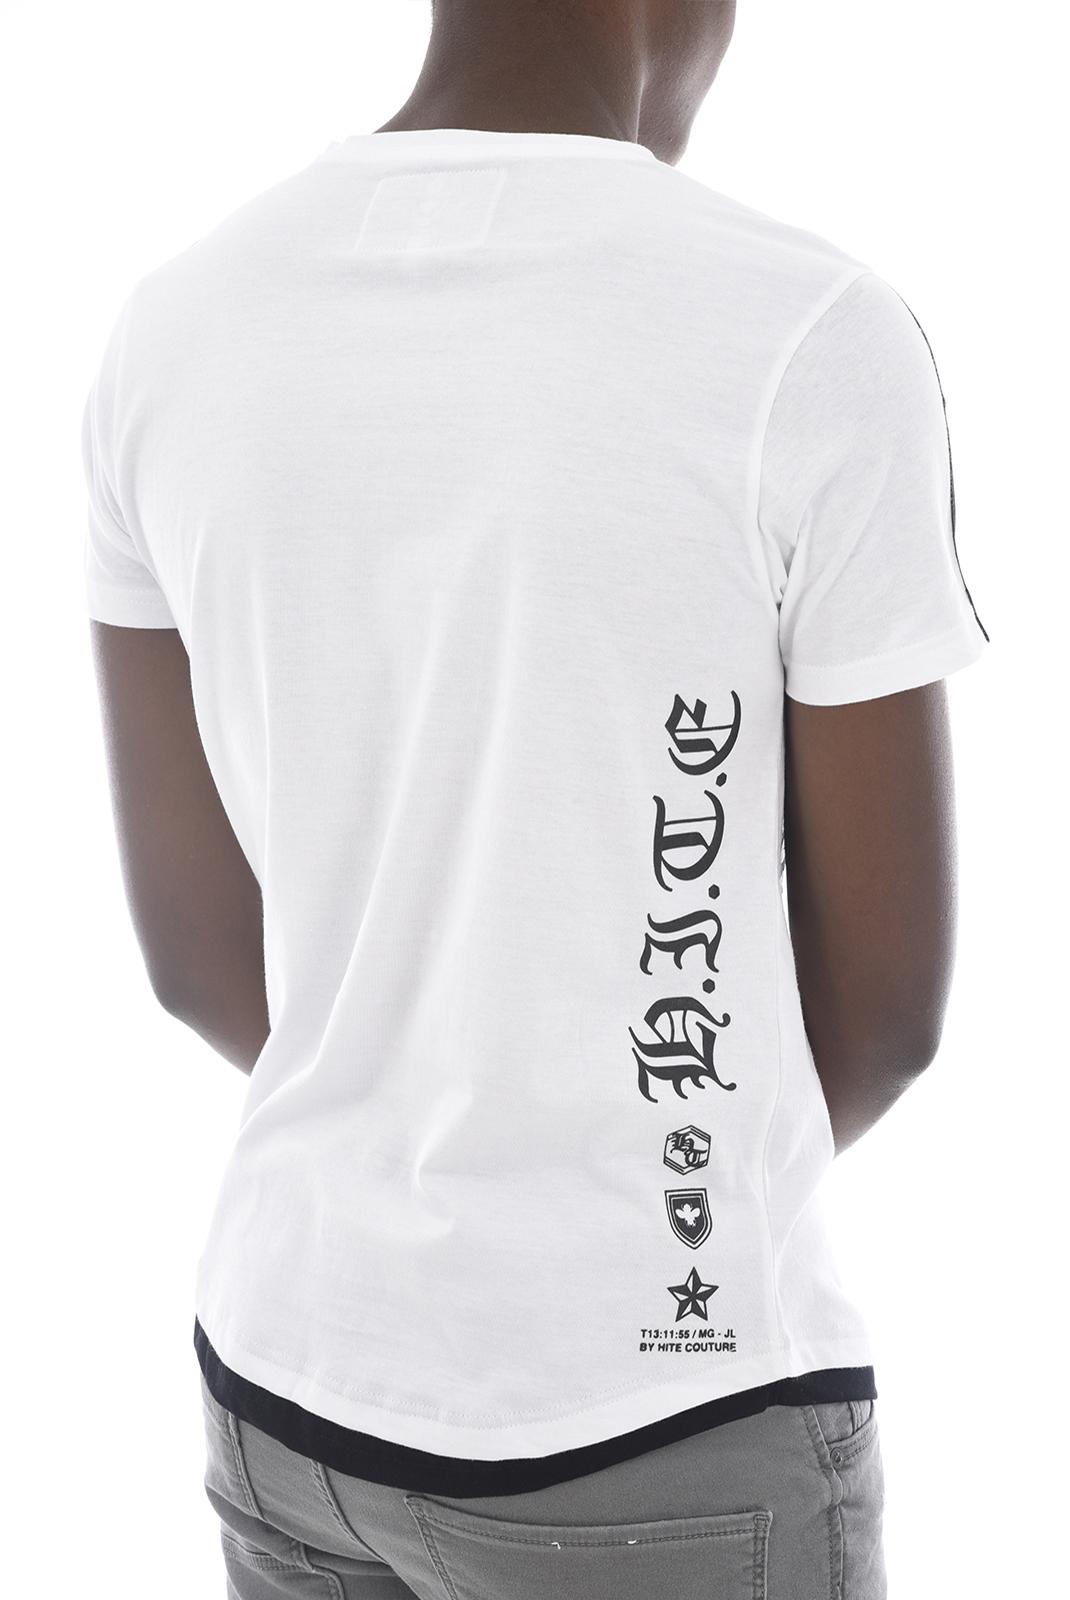 Tee-shirts  Hite couture MOBIER WHITE